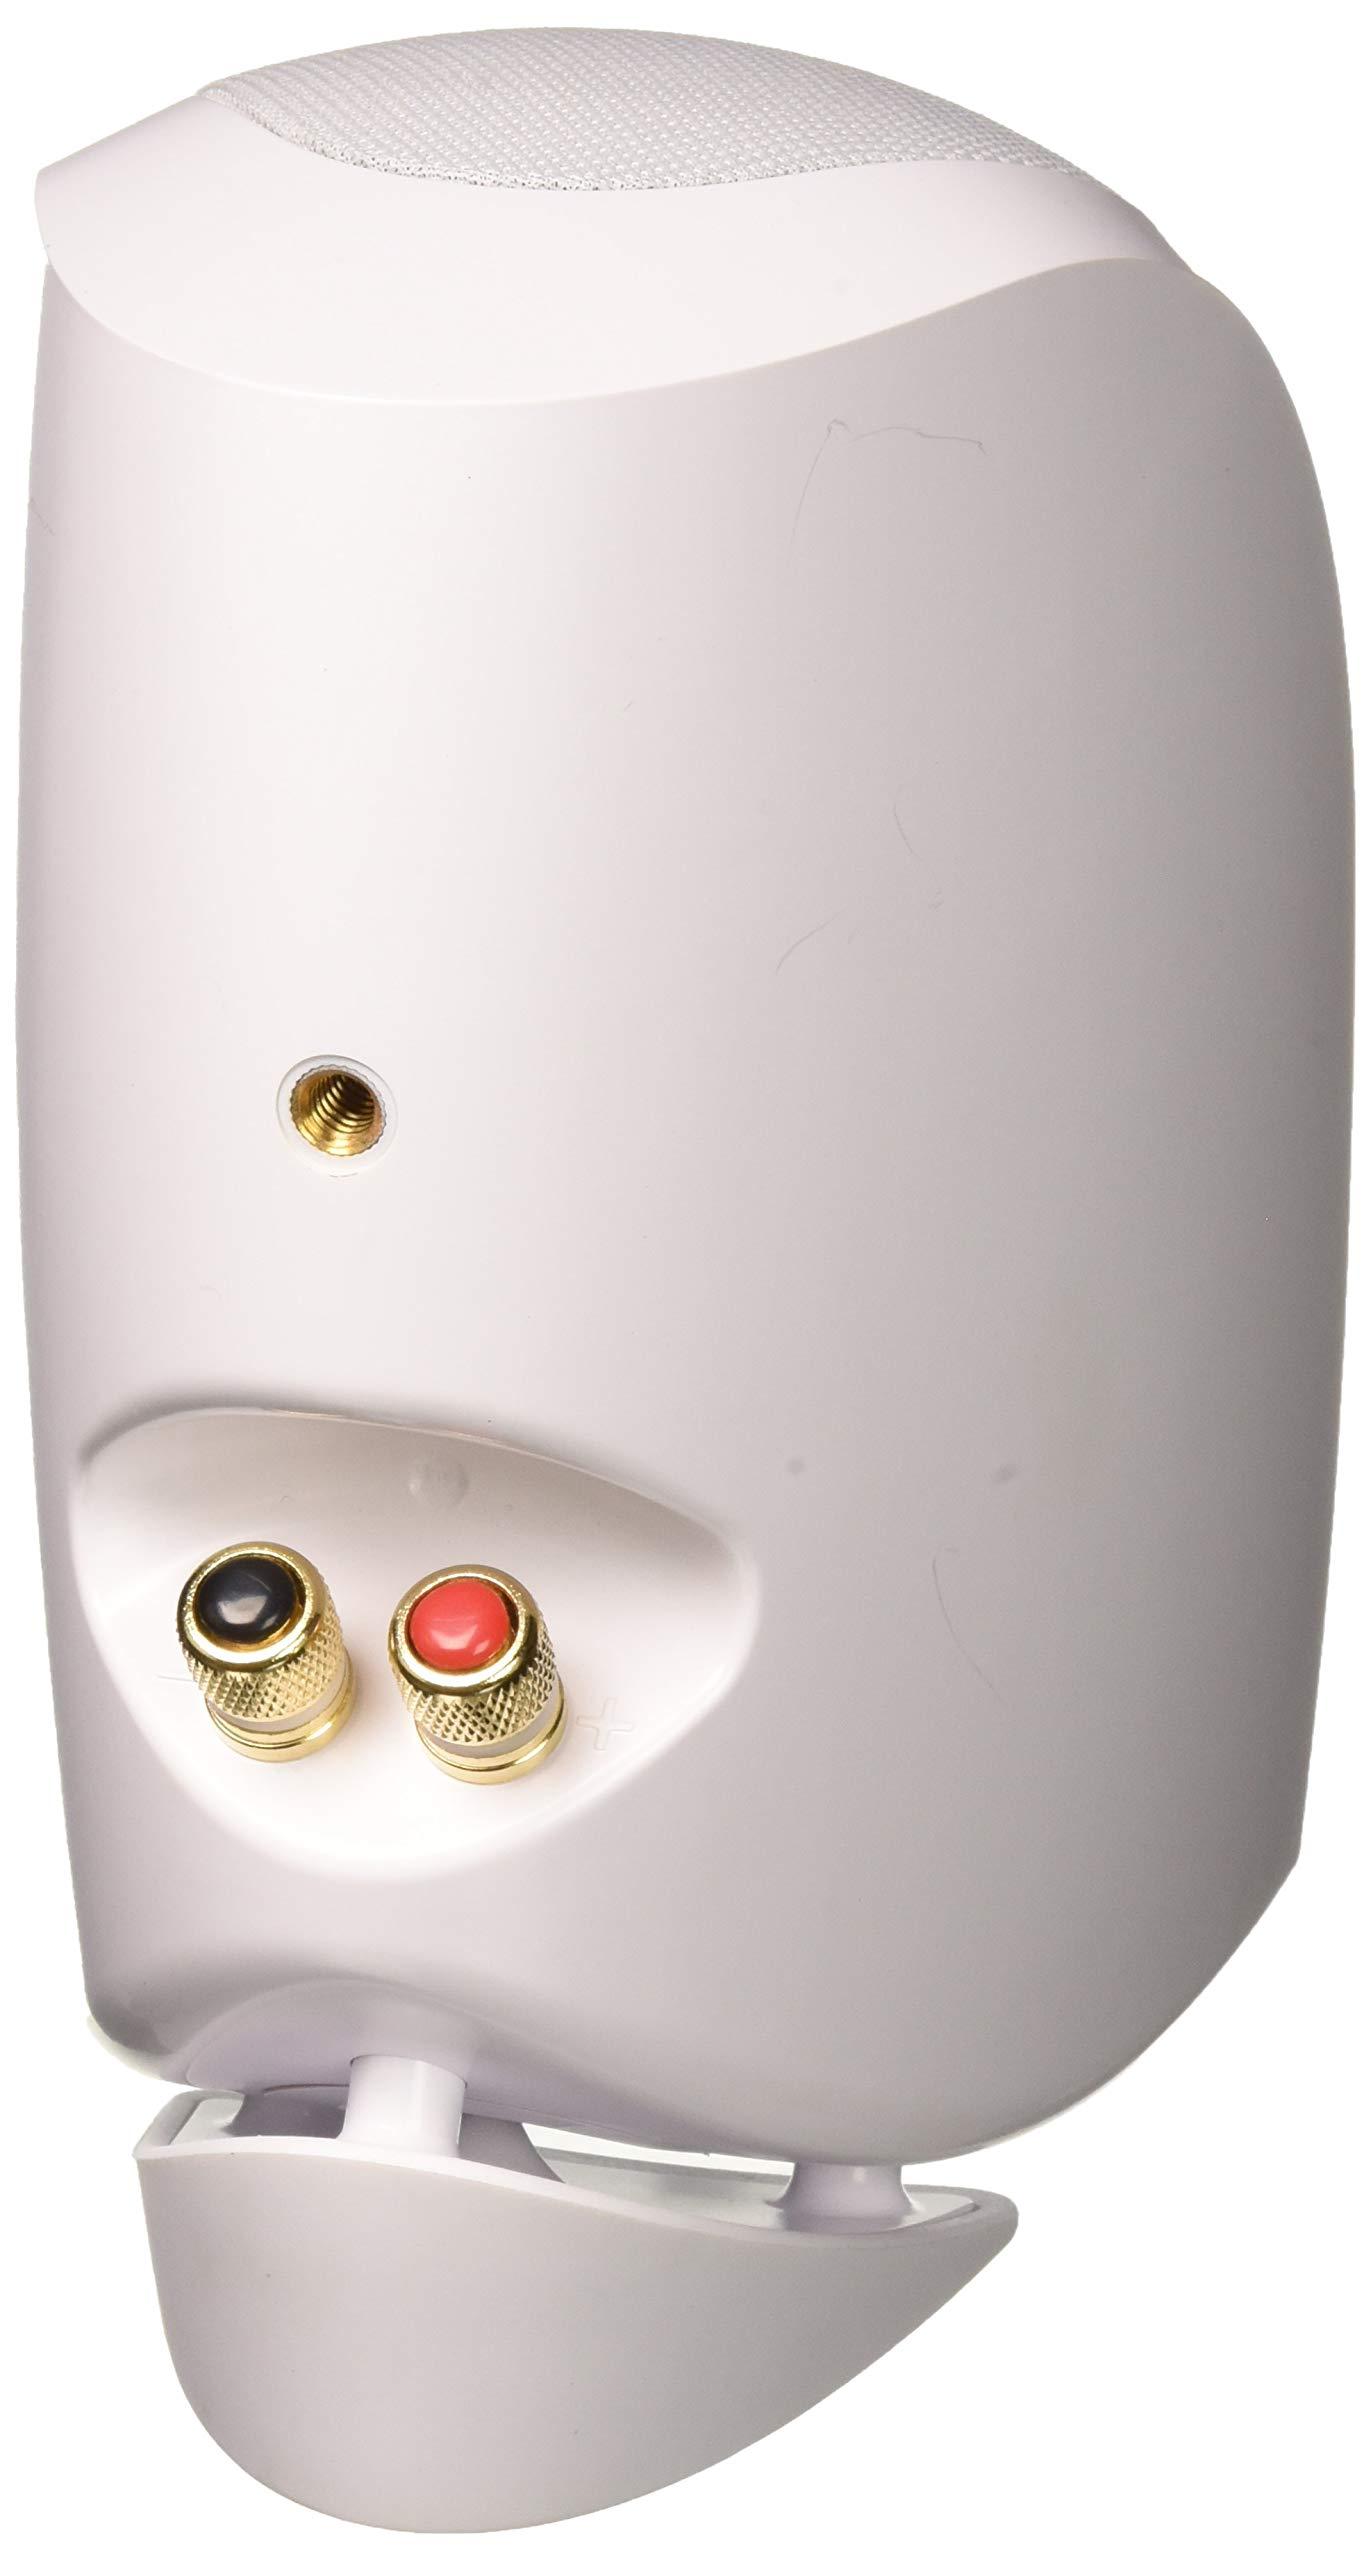 Polk Audio TL3 White (Ea) Satellite Speaker by Polk Audio (Image #2)